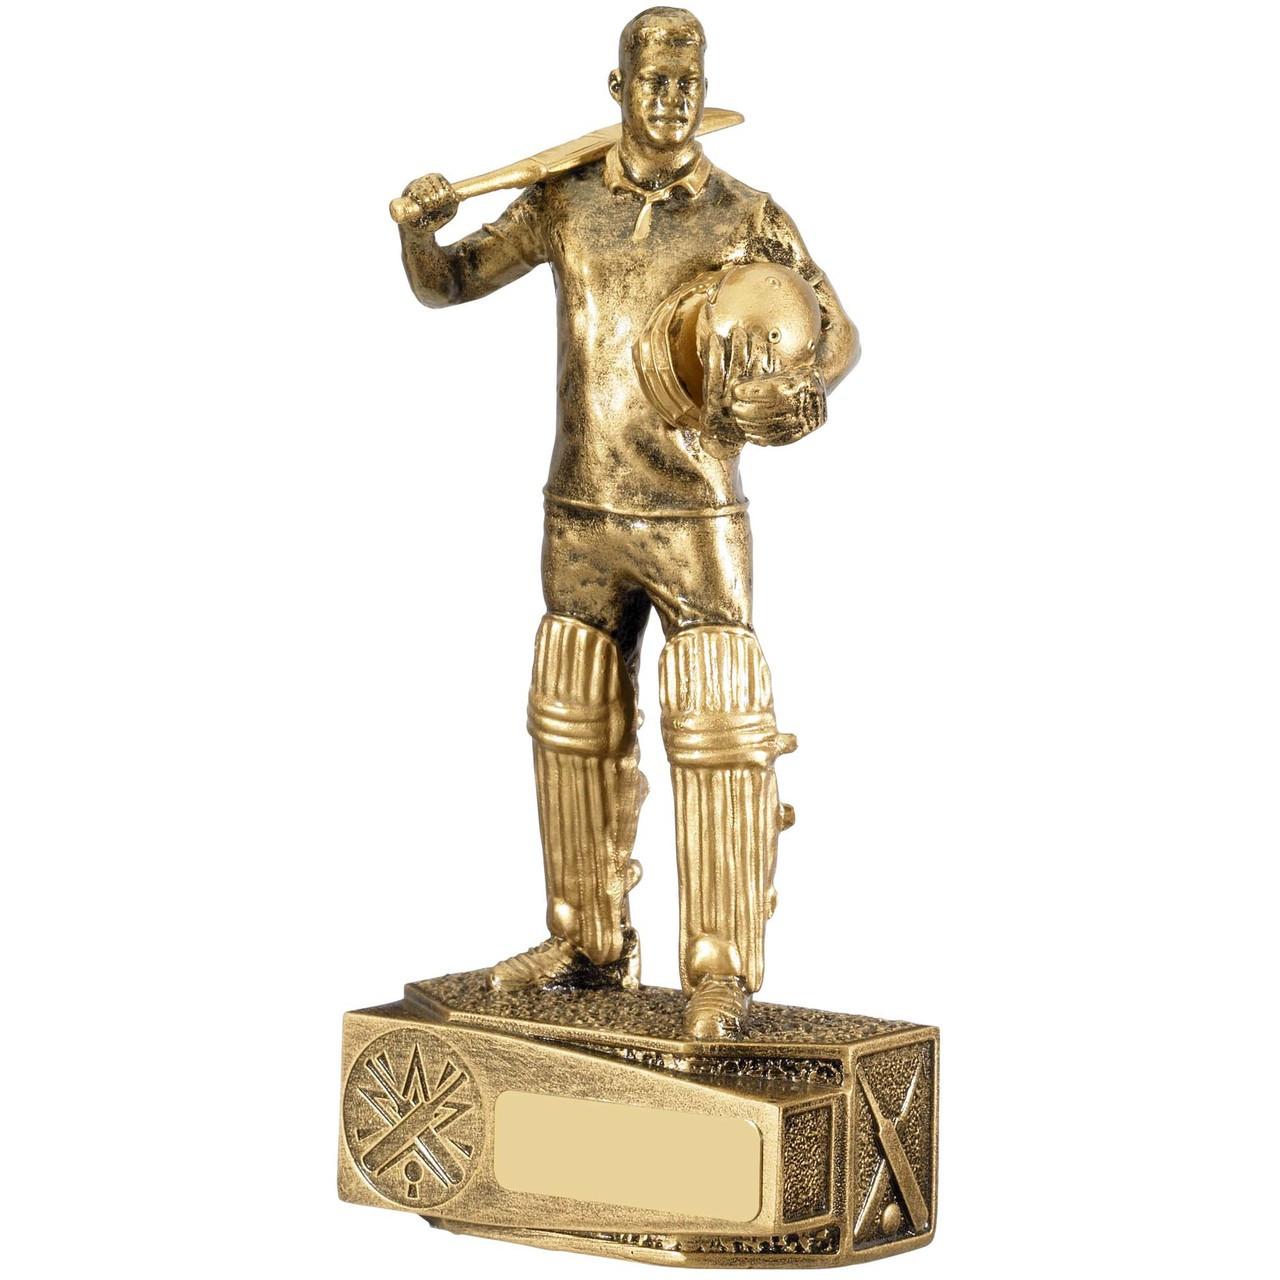 Cricket Batsman sportsman in a beautiful antique gold finish 1stPlace4Trophies